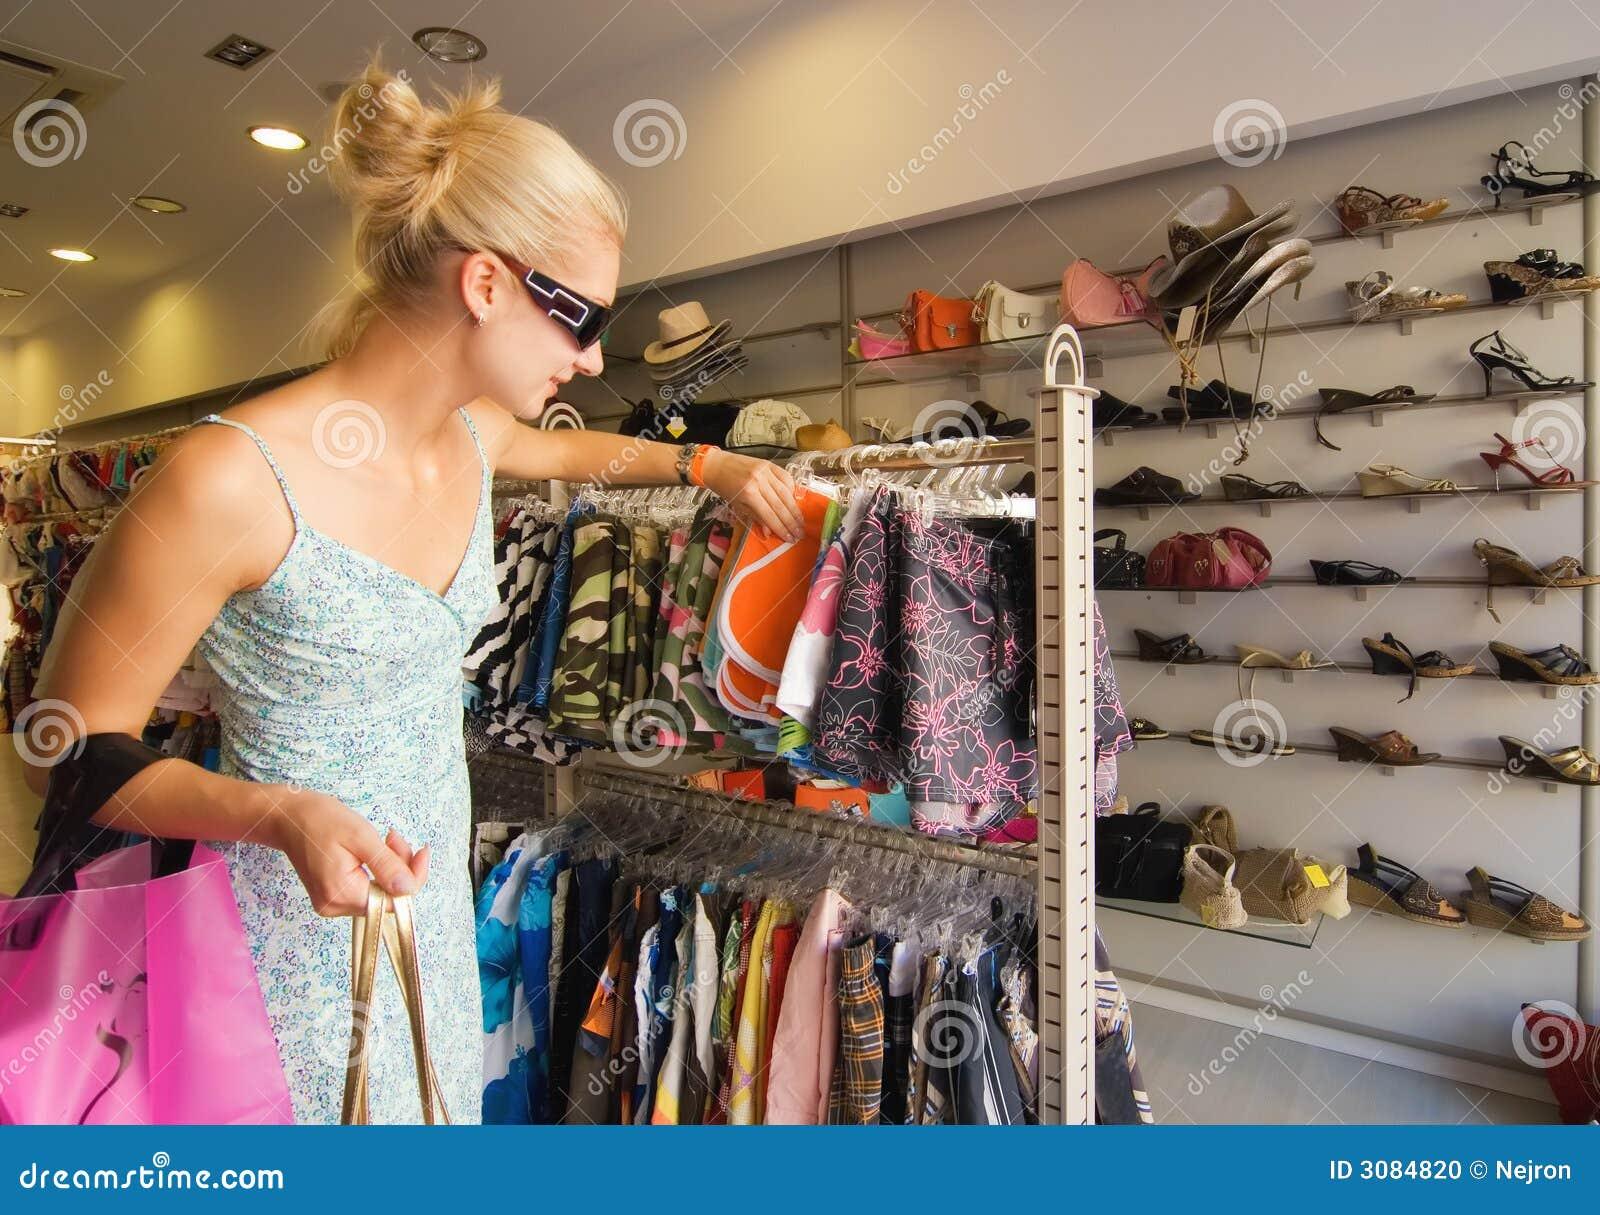 Blong girl buying clothes